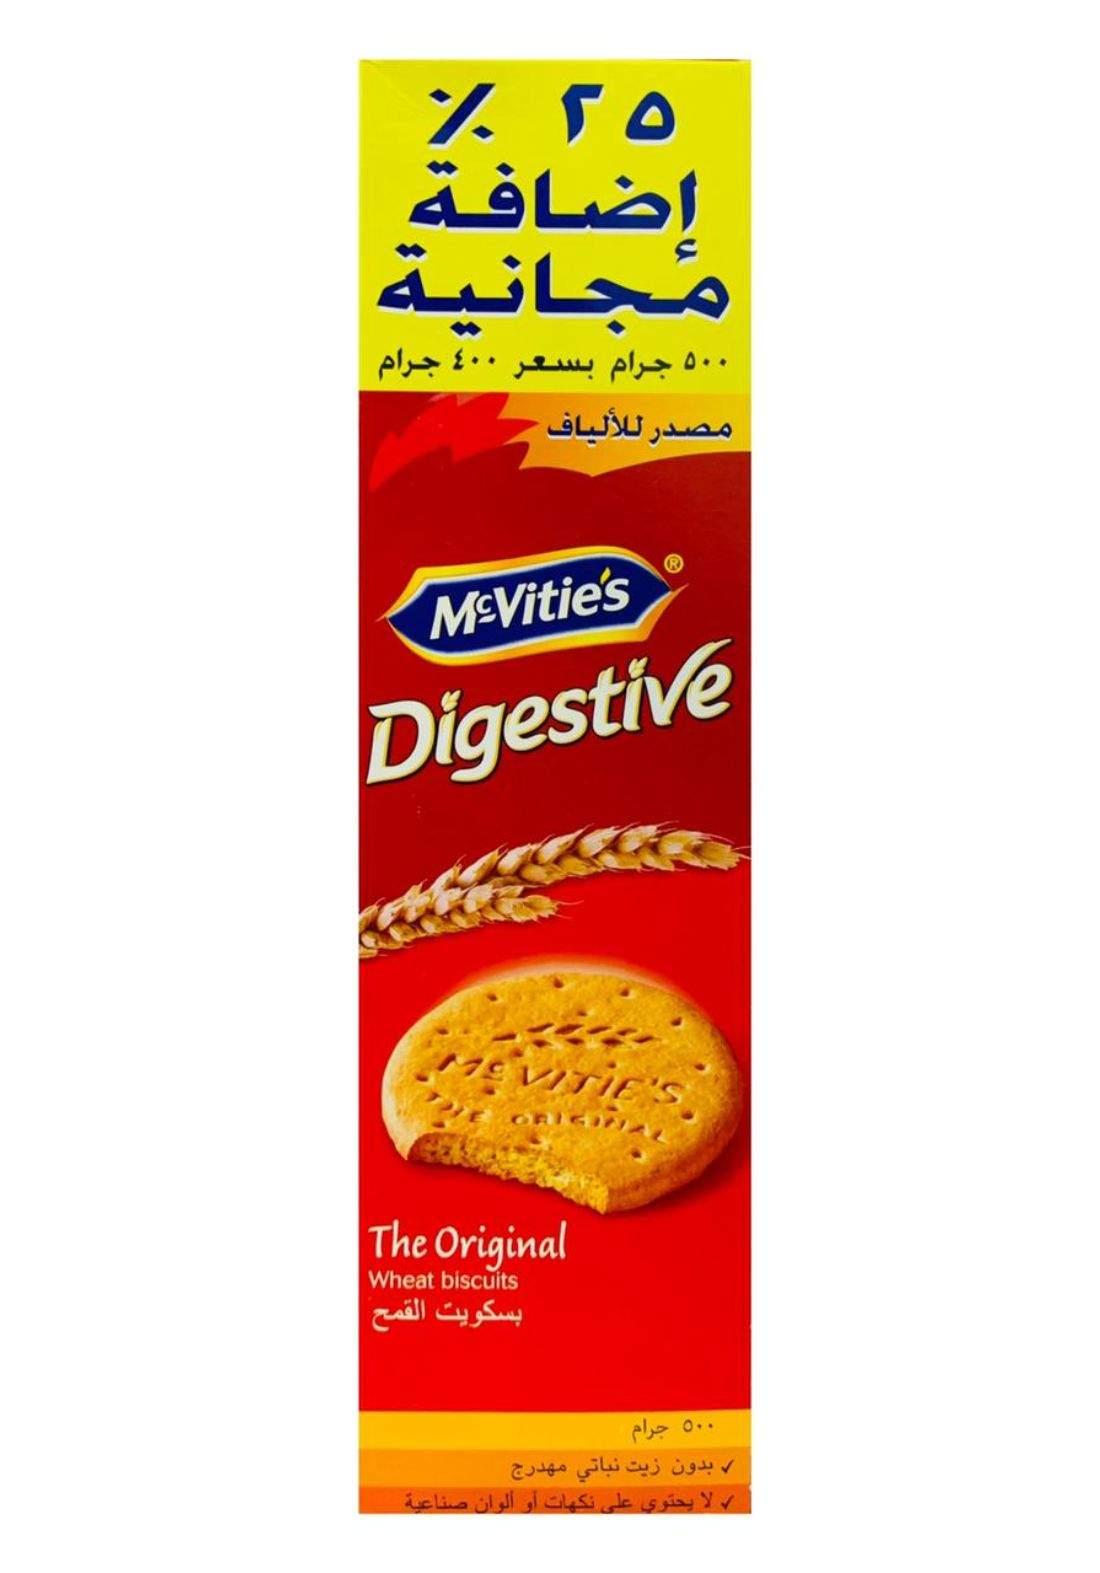 Digestive Biscuits 500g بسكويت دايسجتف